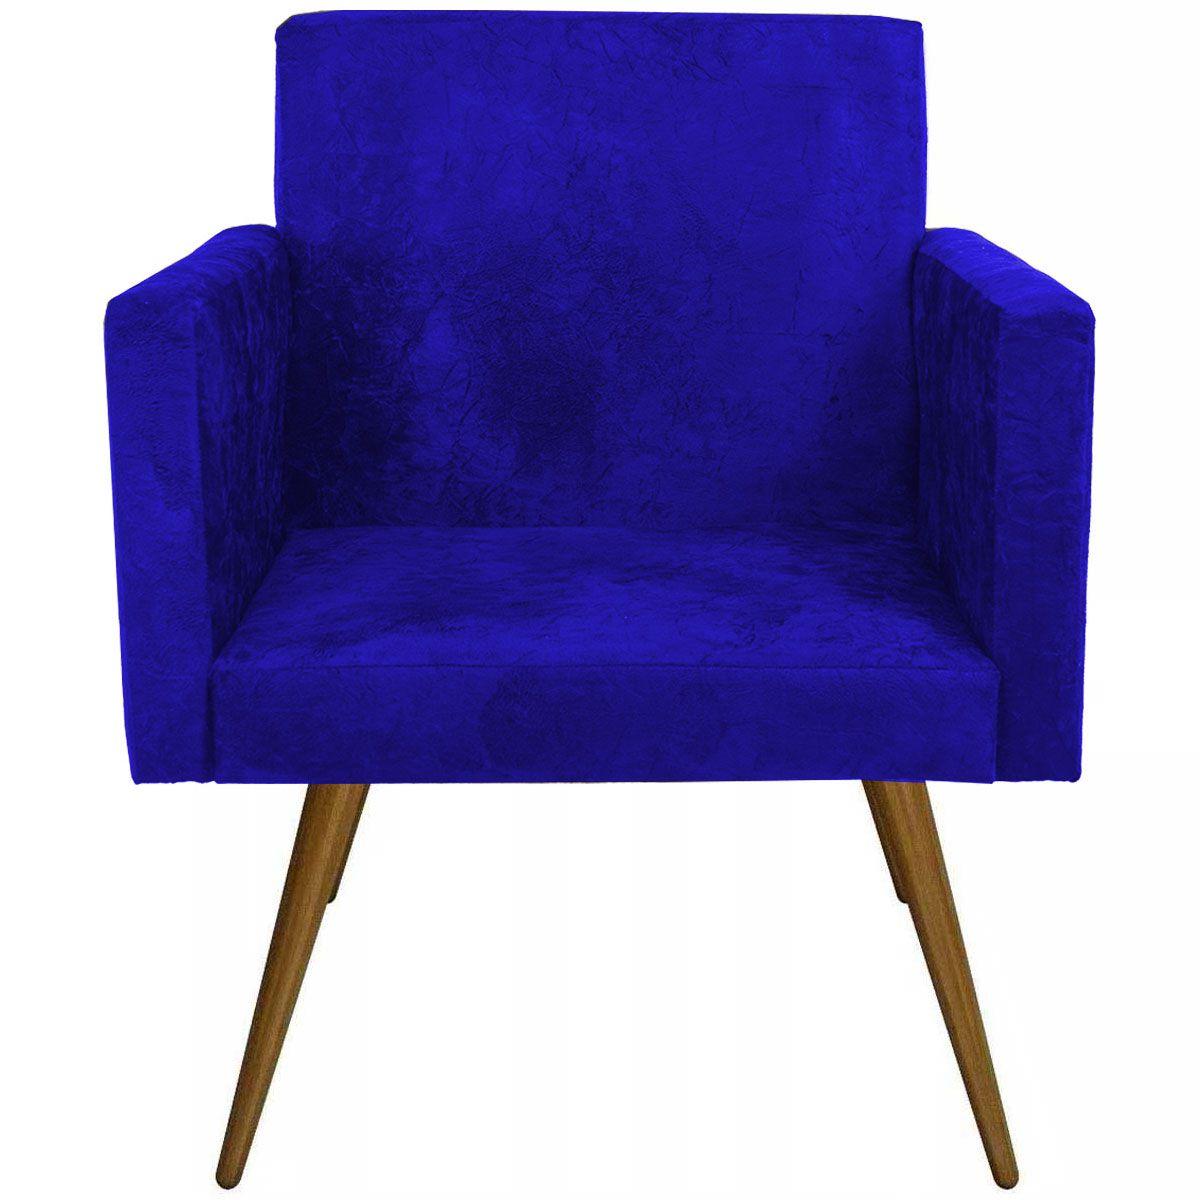 Poltrona Decorativa Nina Luxo Pés Palito Tecido Azul Marinho